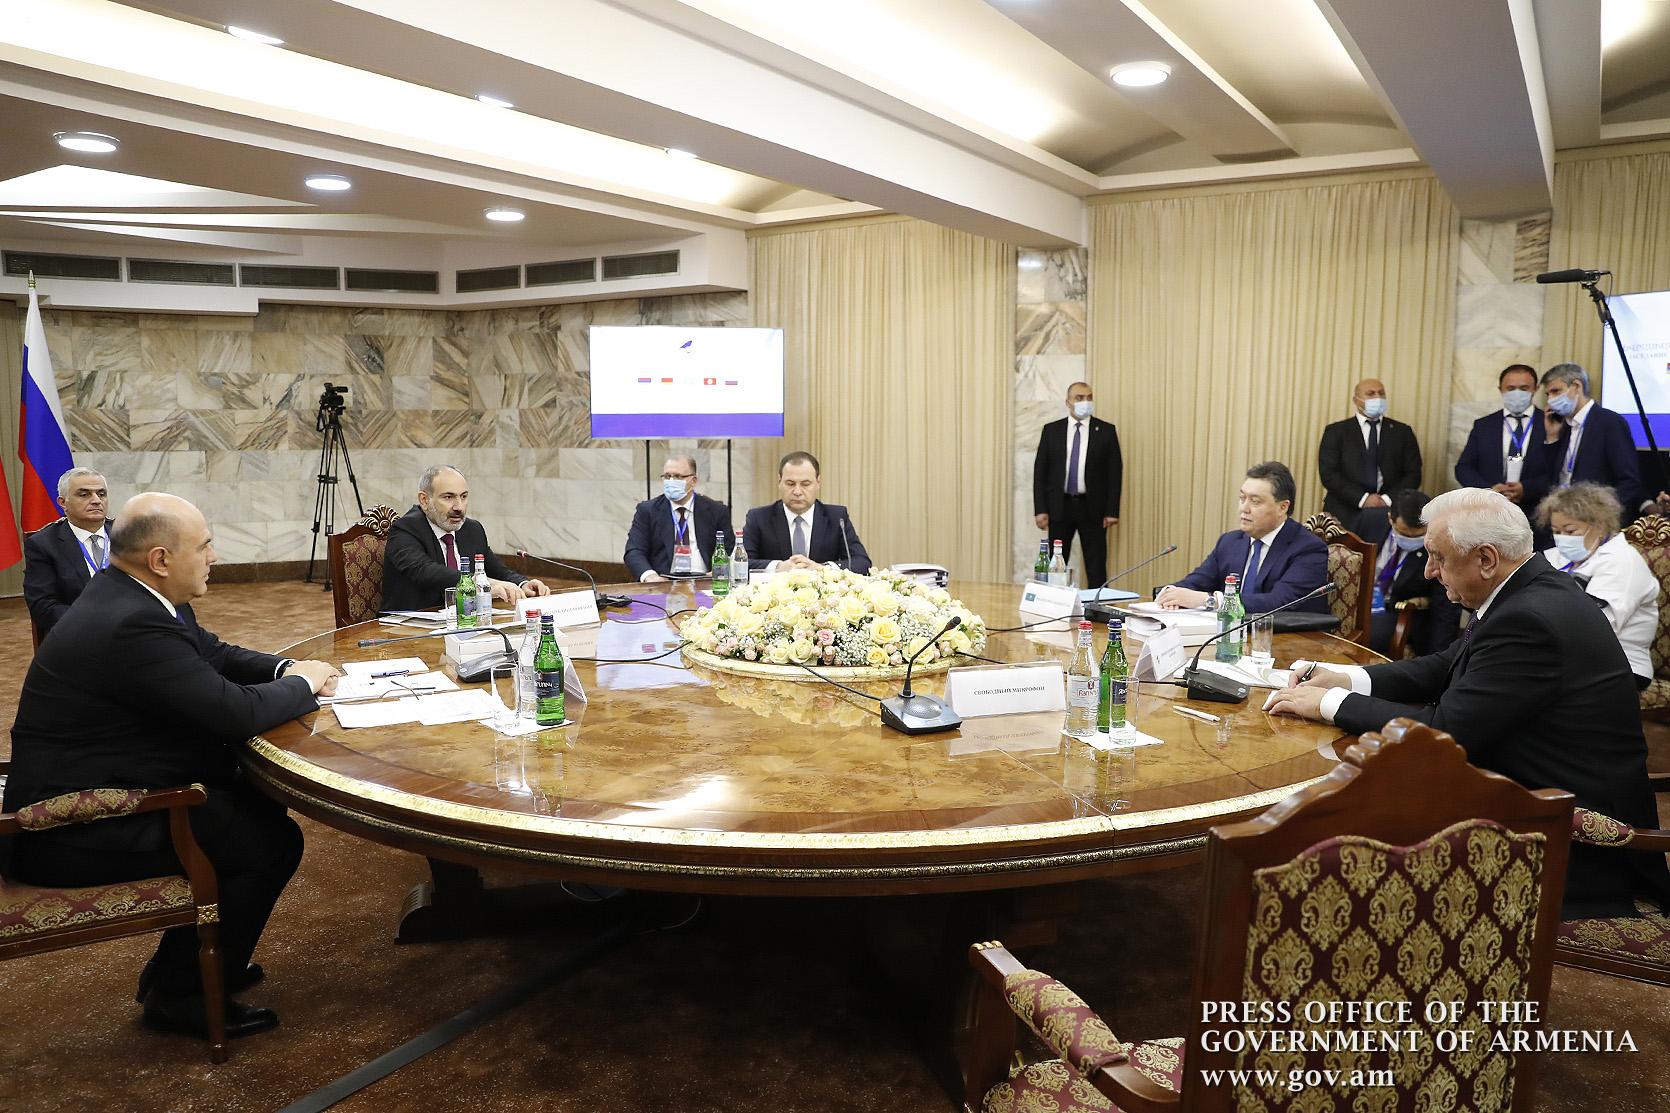 Photo of Несмотря на все трудности, наш народ един как никогда: Никол Пашинян